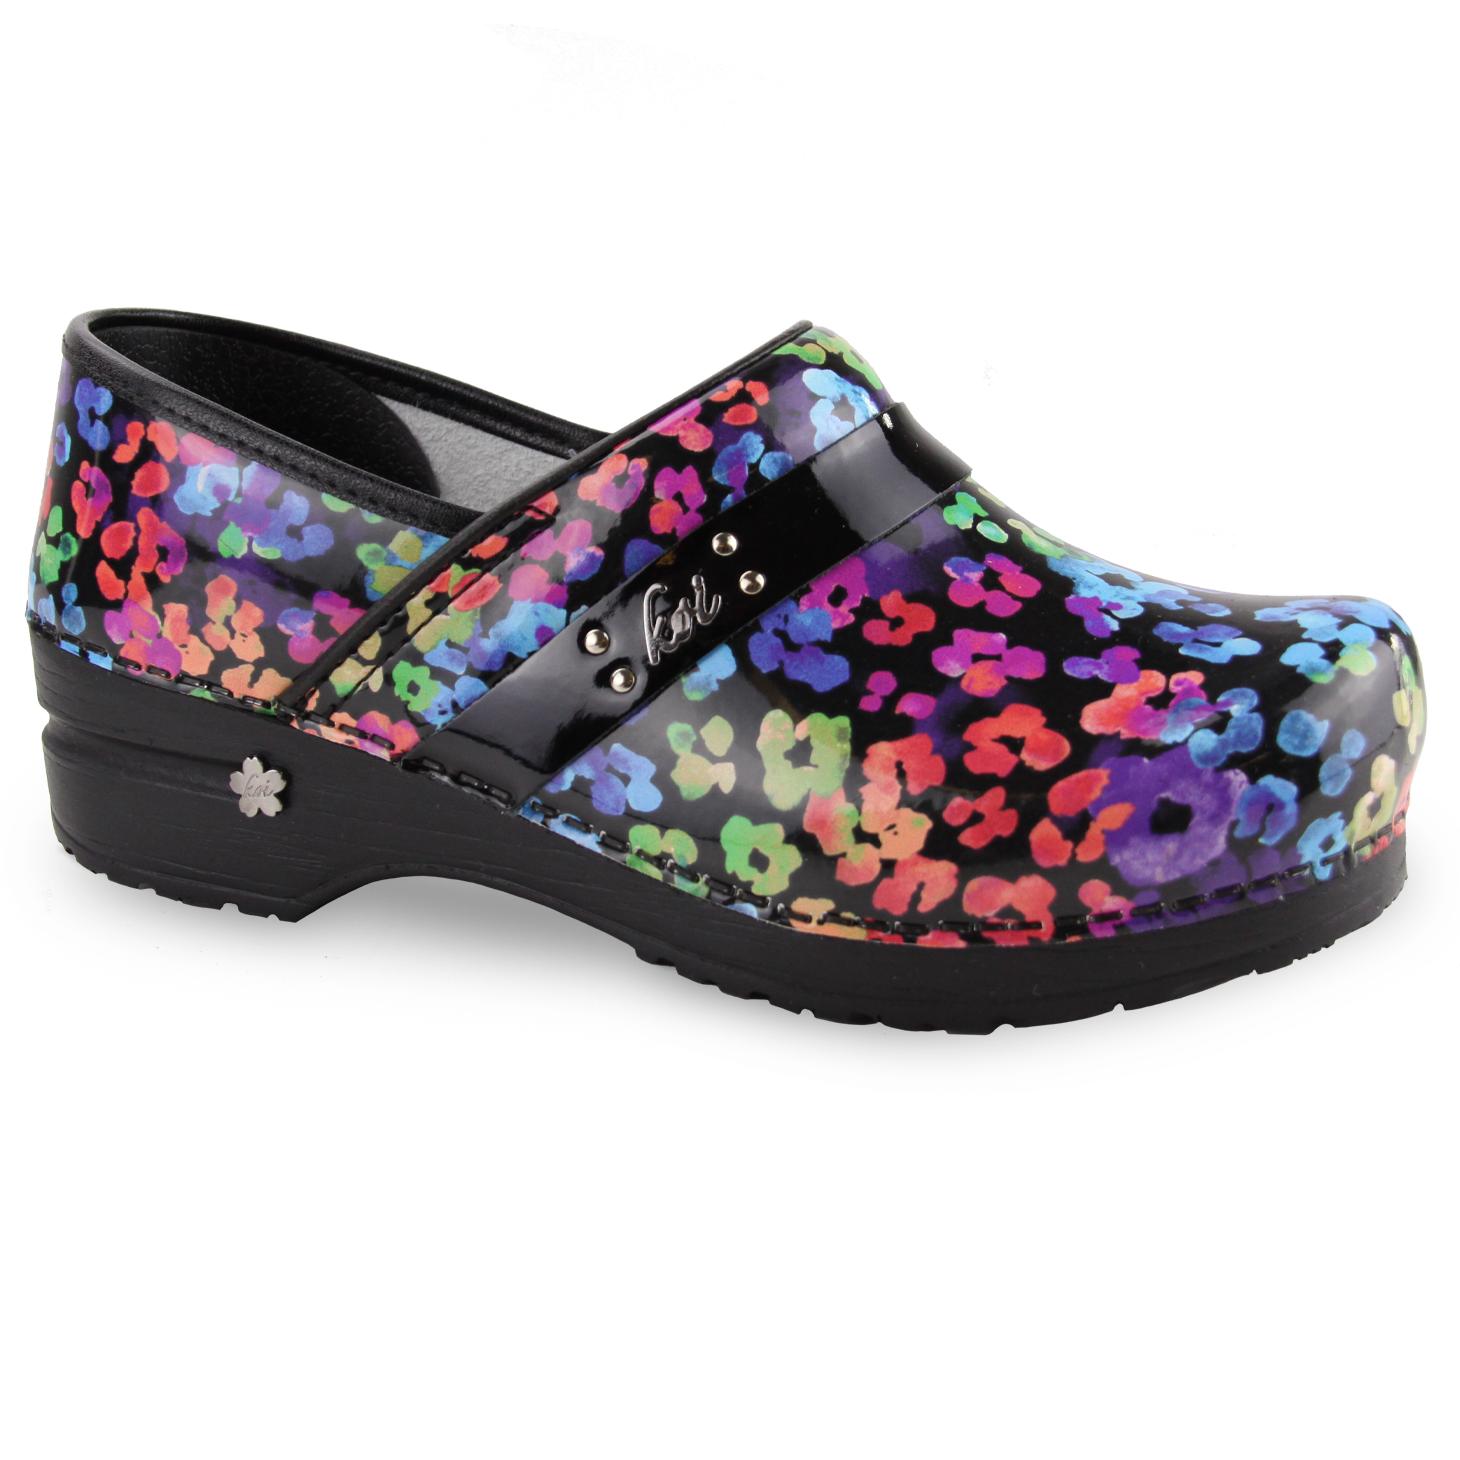 ASHBURY Women's Clogs-Sanita